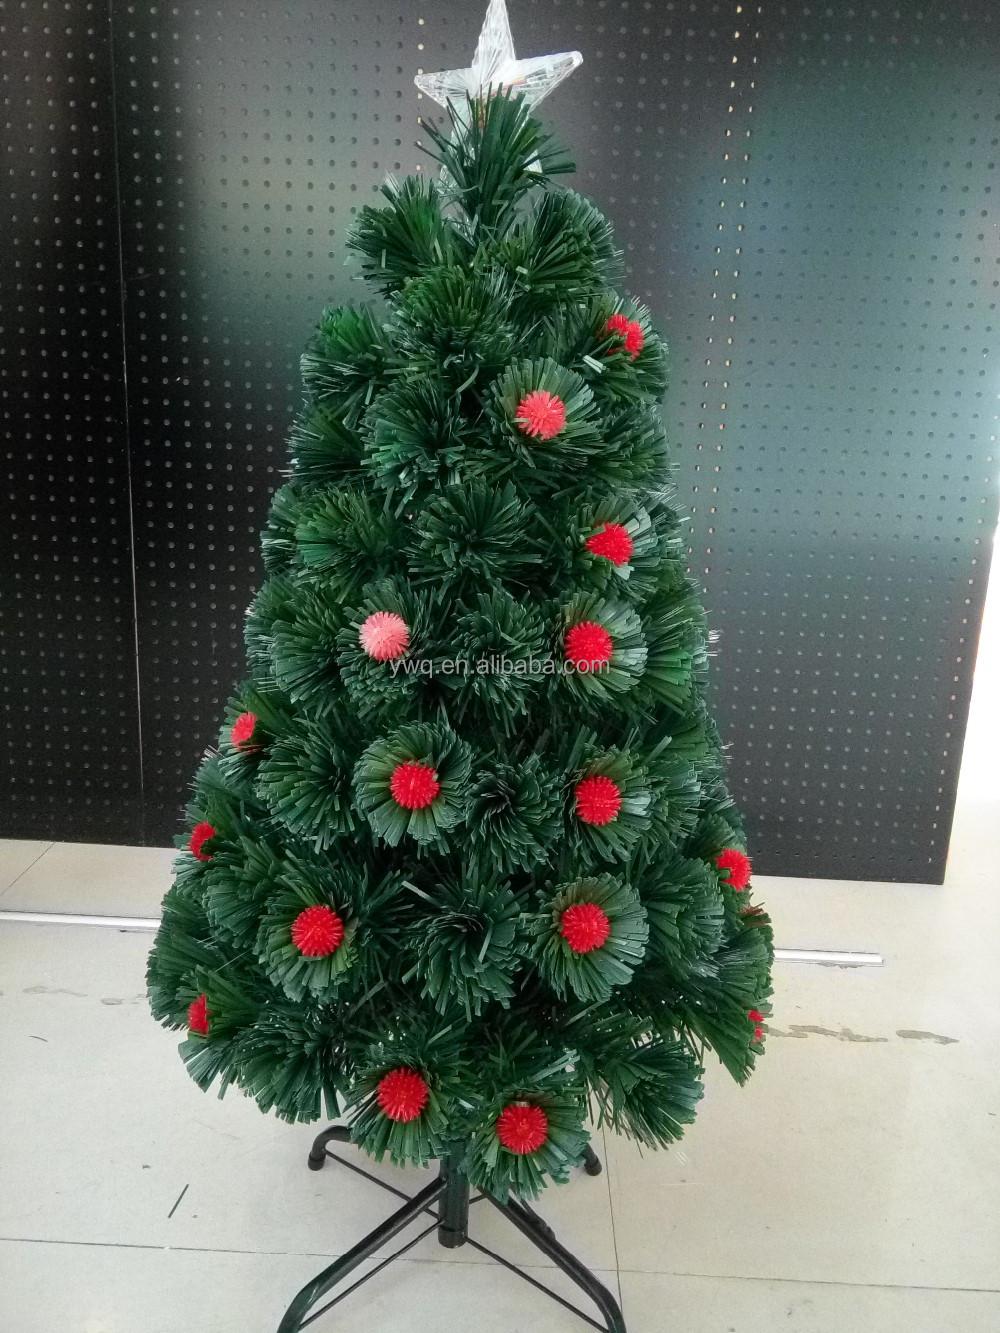 7ft Fiber Optic Christmas Tree, 7ft Fiber Optic Christmas Tree ...